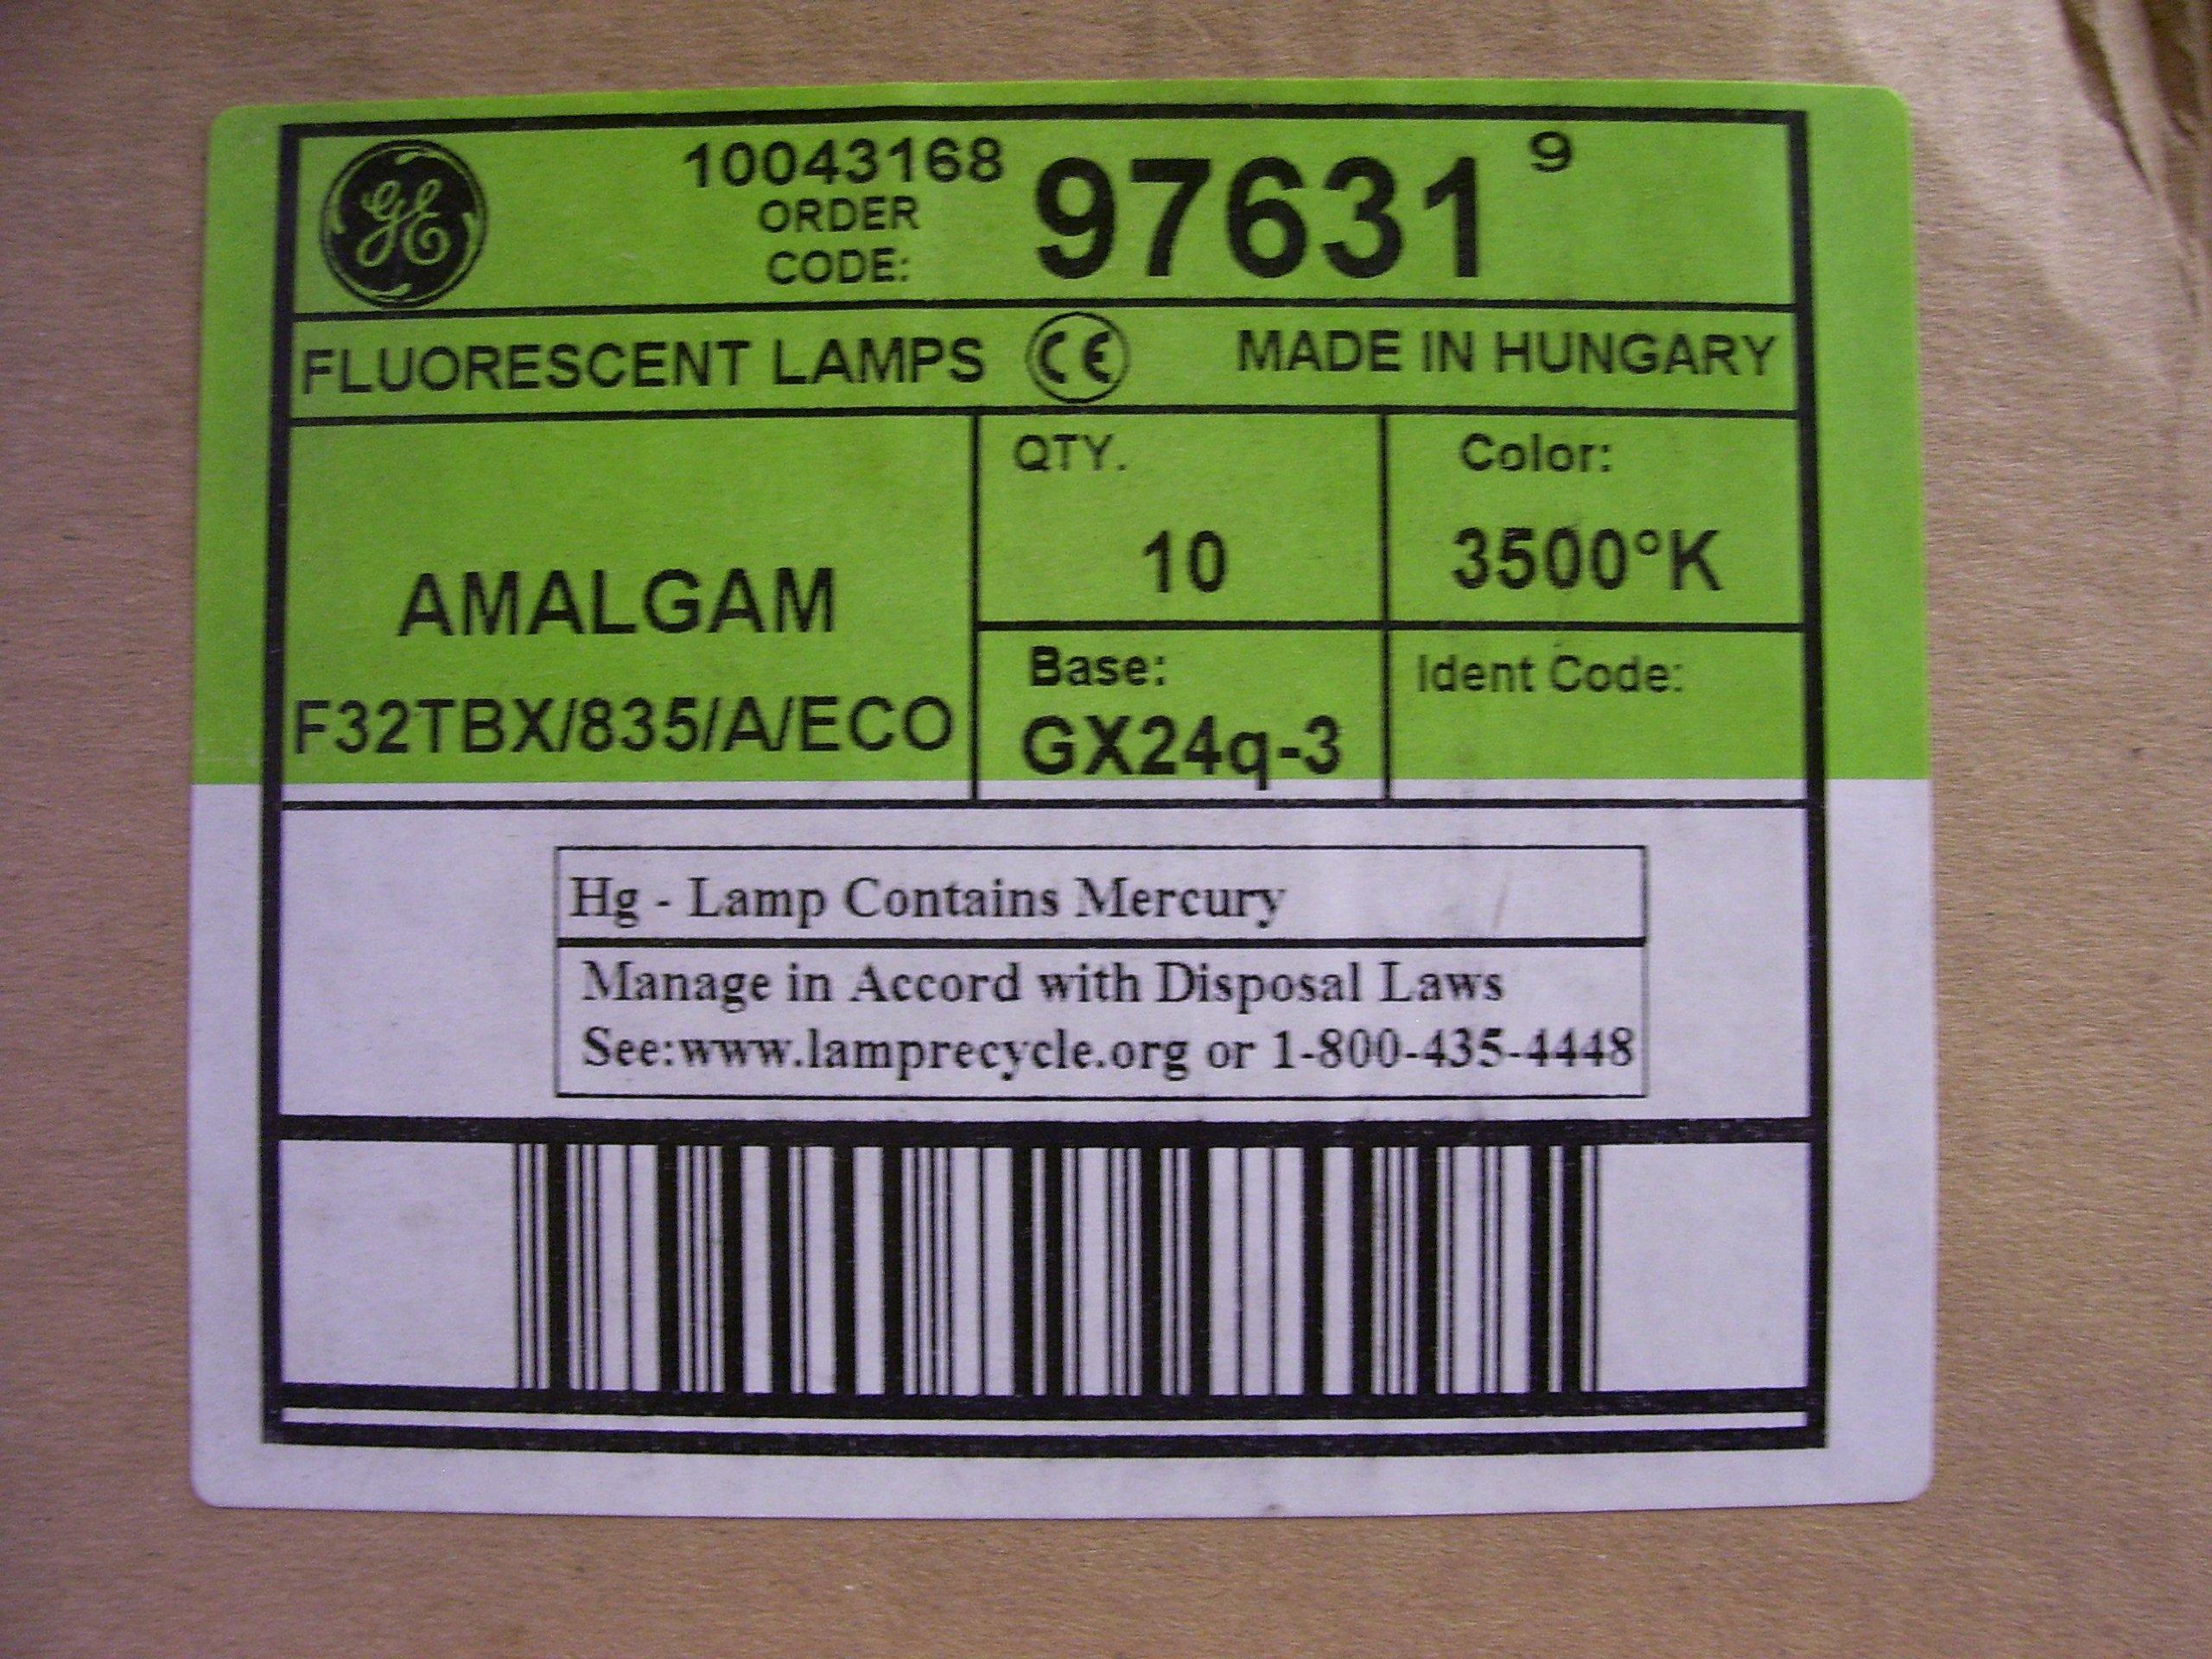 10pc GE 97631 - F32TBX/835/A/ECO 32-Watt 2400-Lumen General Purpose Ecolux T4 CFL Bulb, White (Lot of 10)